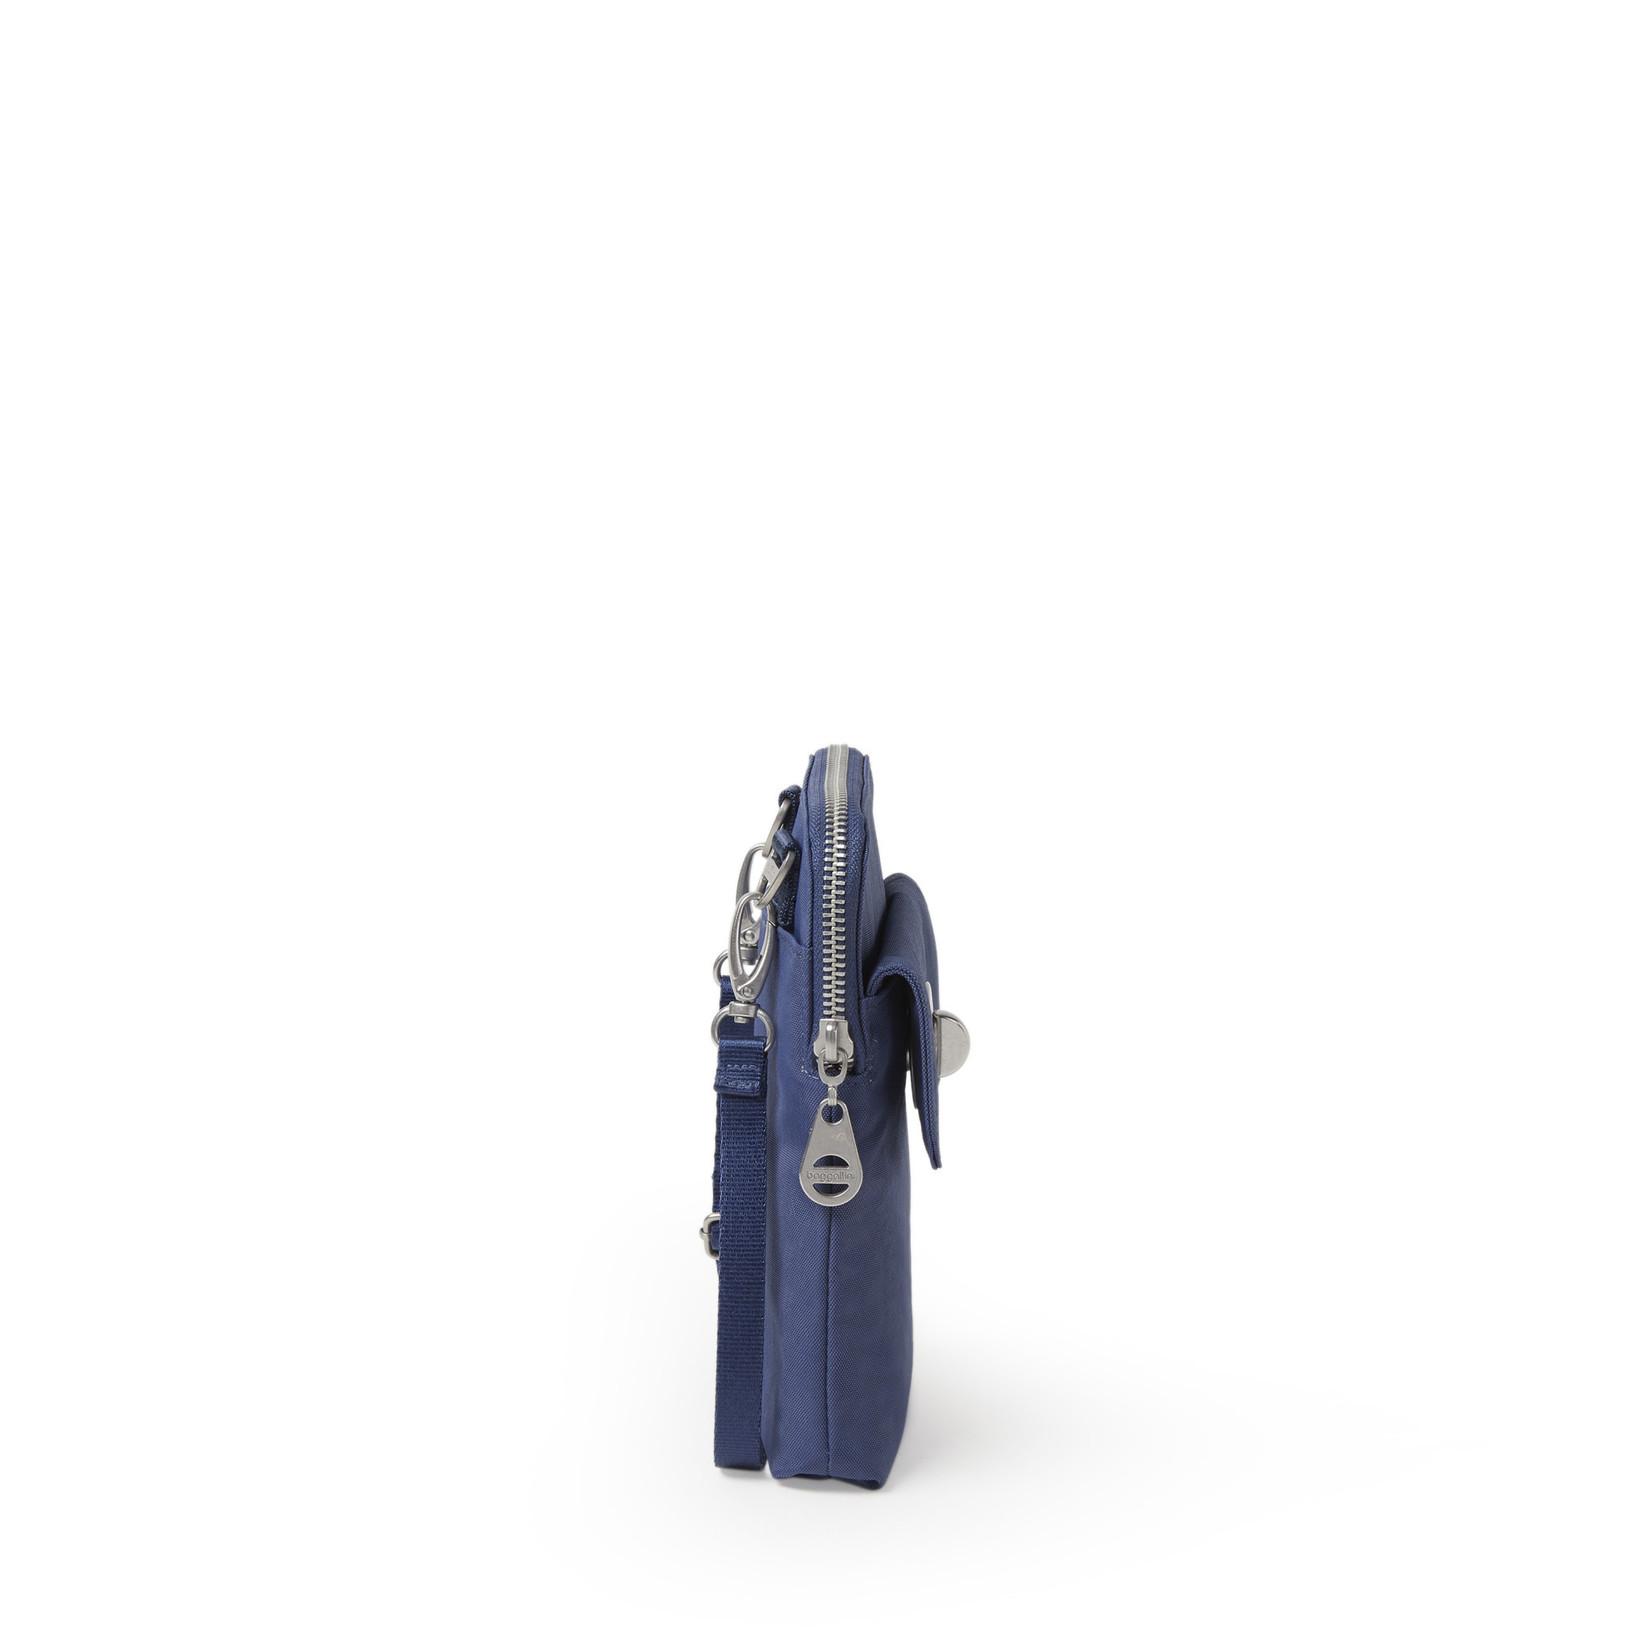 Baggallini Lima RFID Mini Bag - Indigo Sky